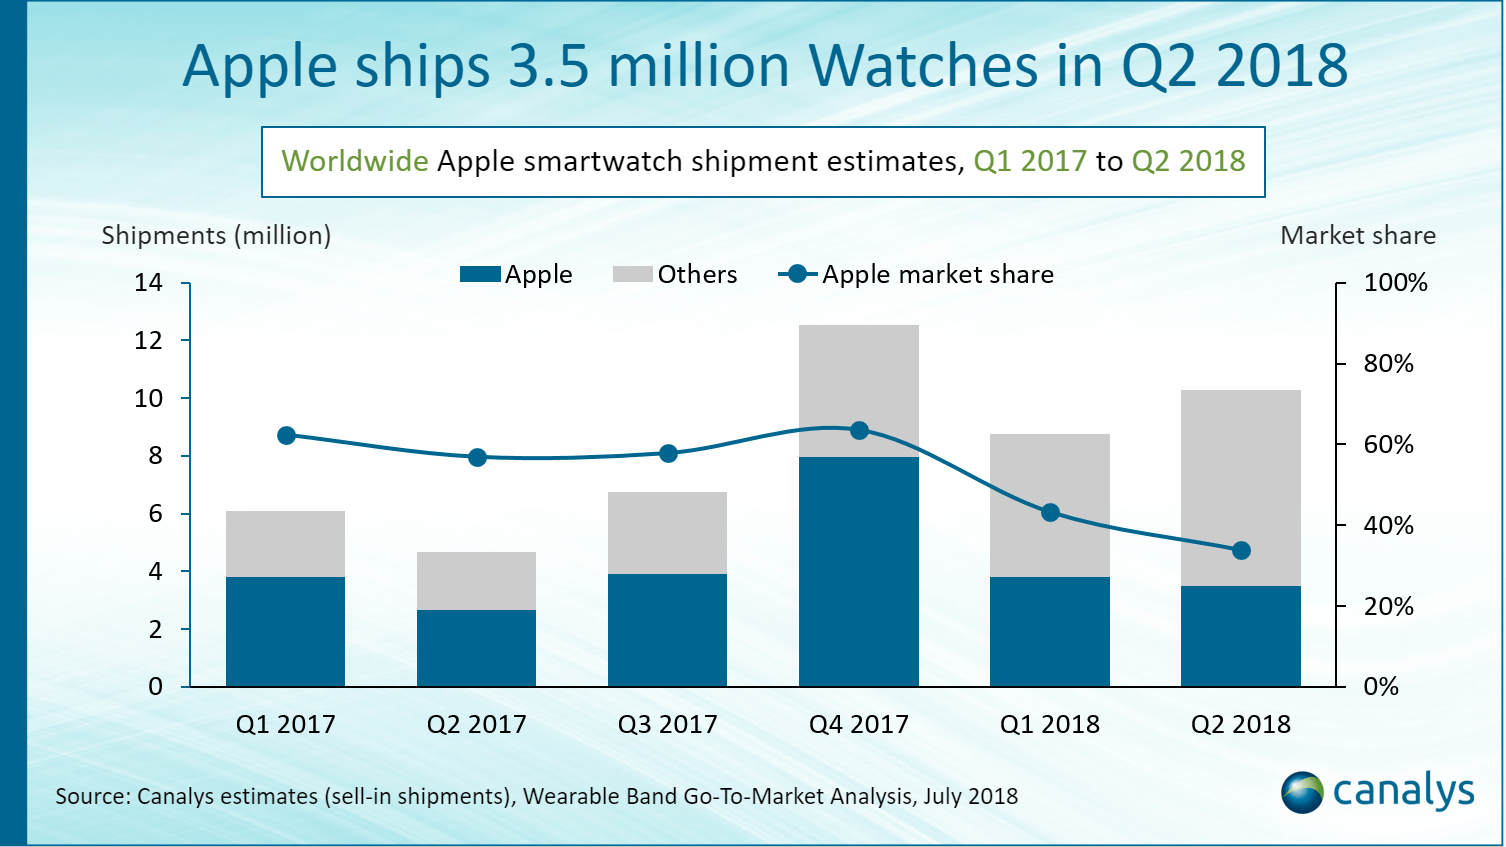 Apple Watch-Verkäufe Q1 2017 bis Q2 2018 - Infografik - Canalys